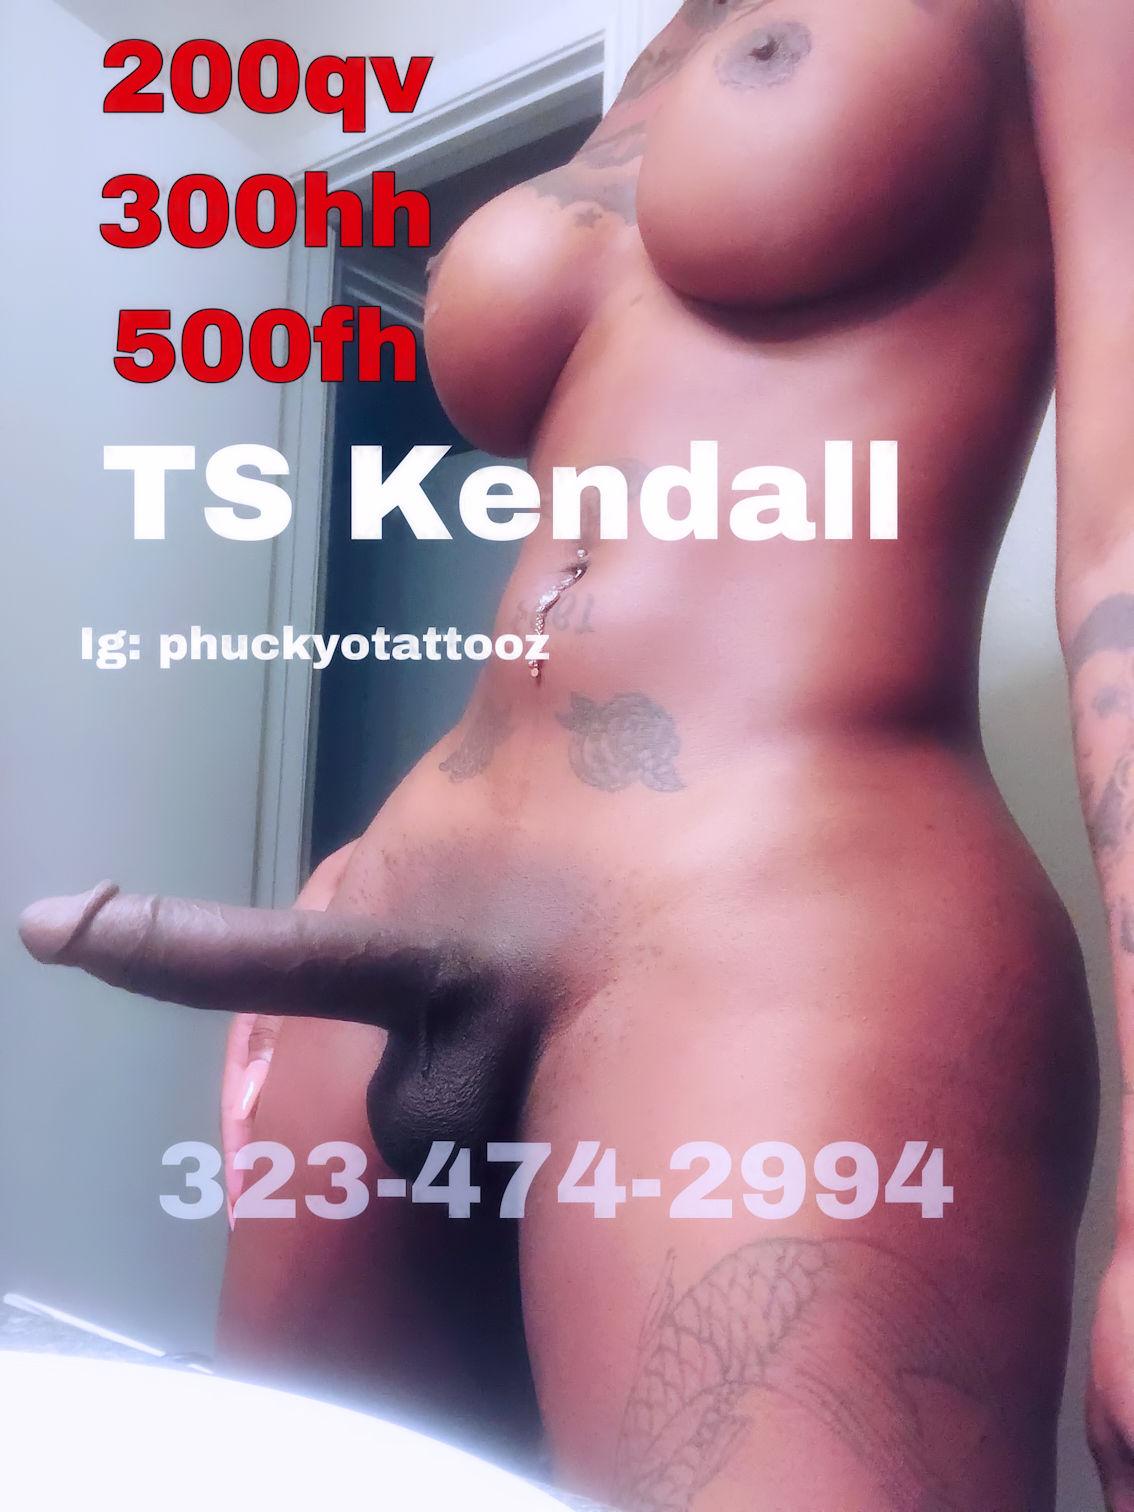 TS Kendall Ebony Atlanta Shemale